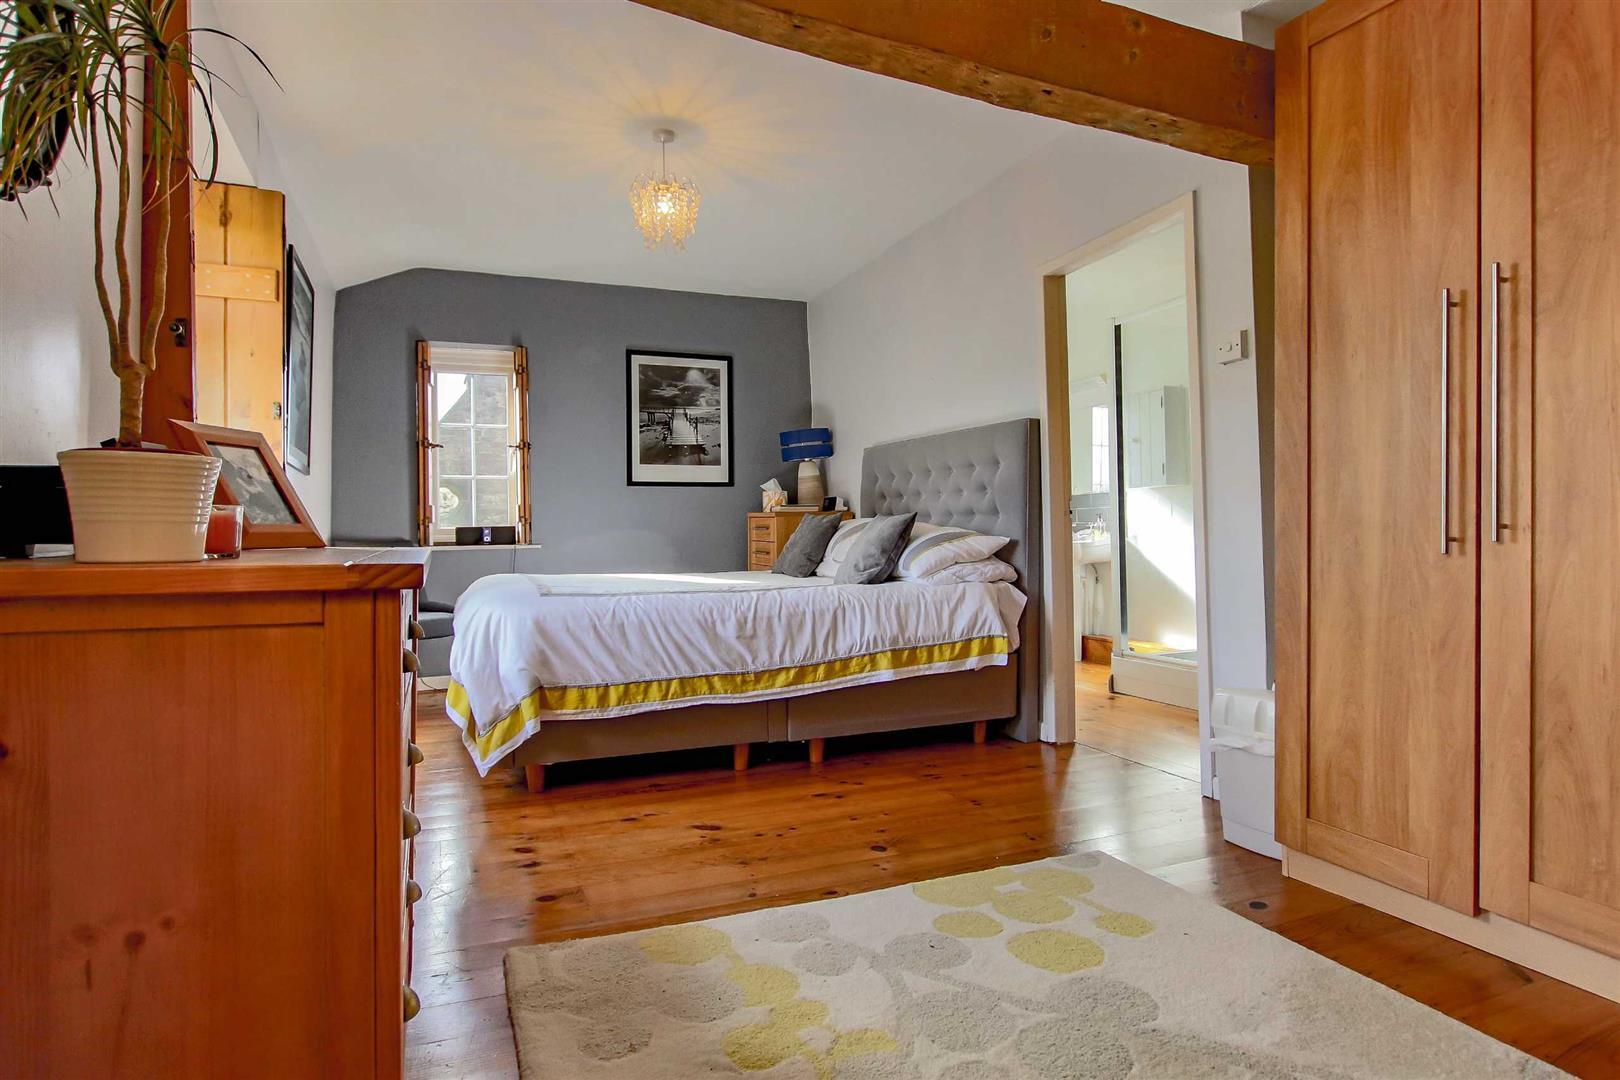 4 Bedroom Detached House For Sale - p033686_06.jpg